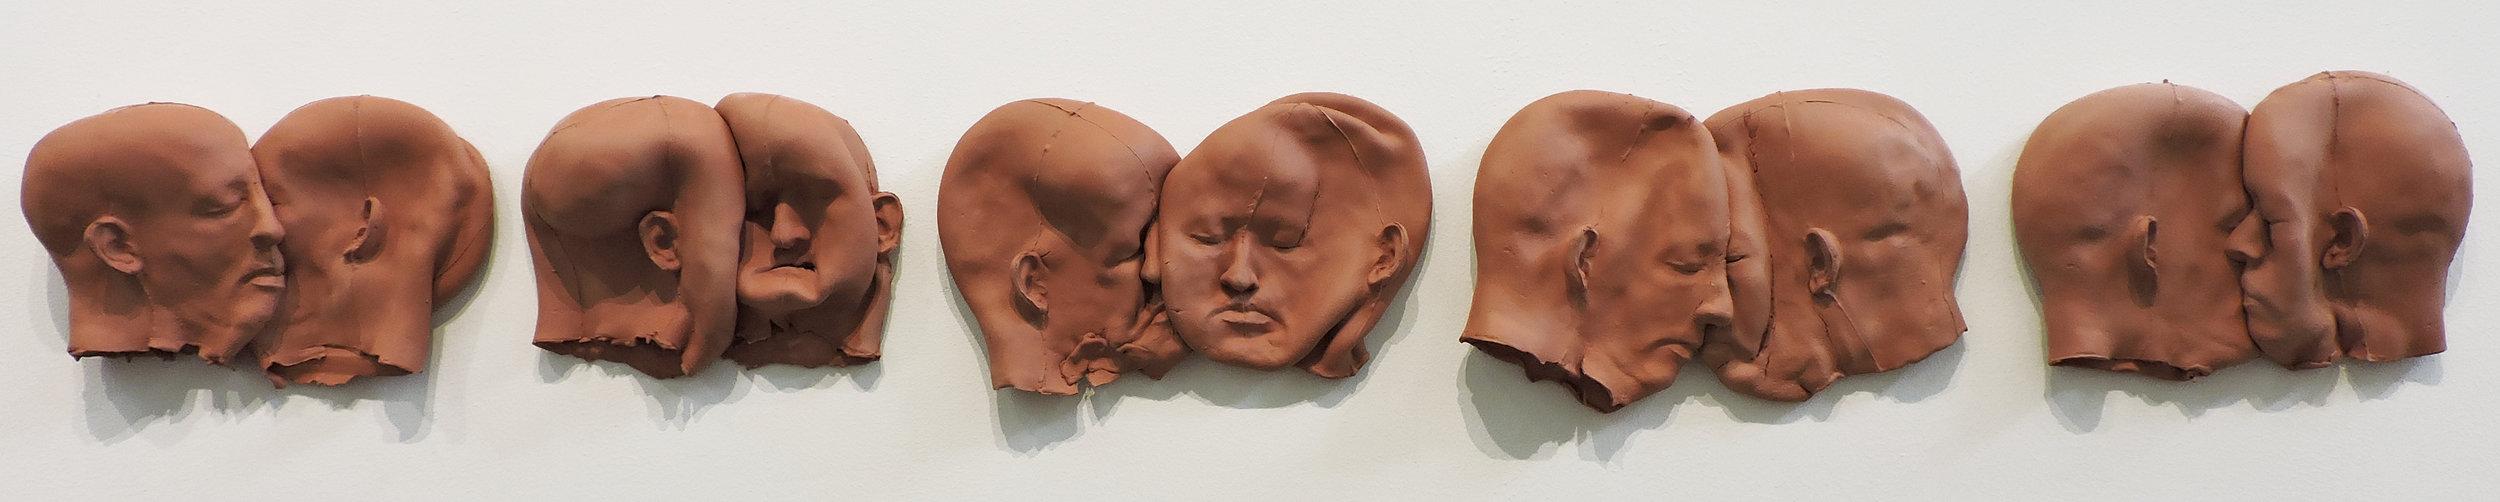 "AMoCA Collection  |  Sentence , ceramic, 9.5""x80""x3.5"", 2014"